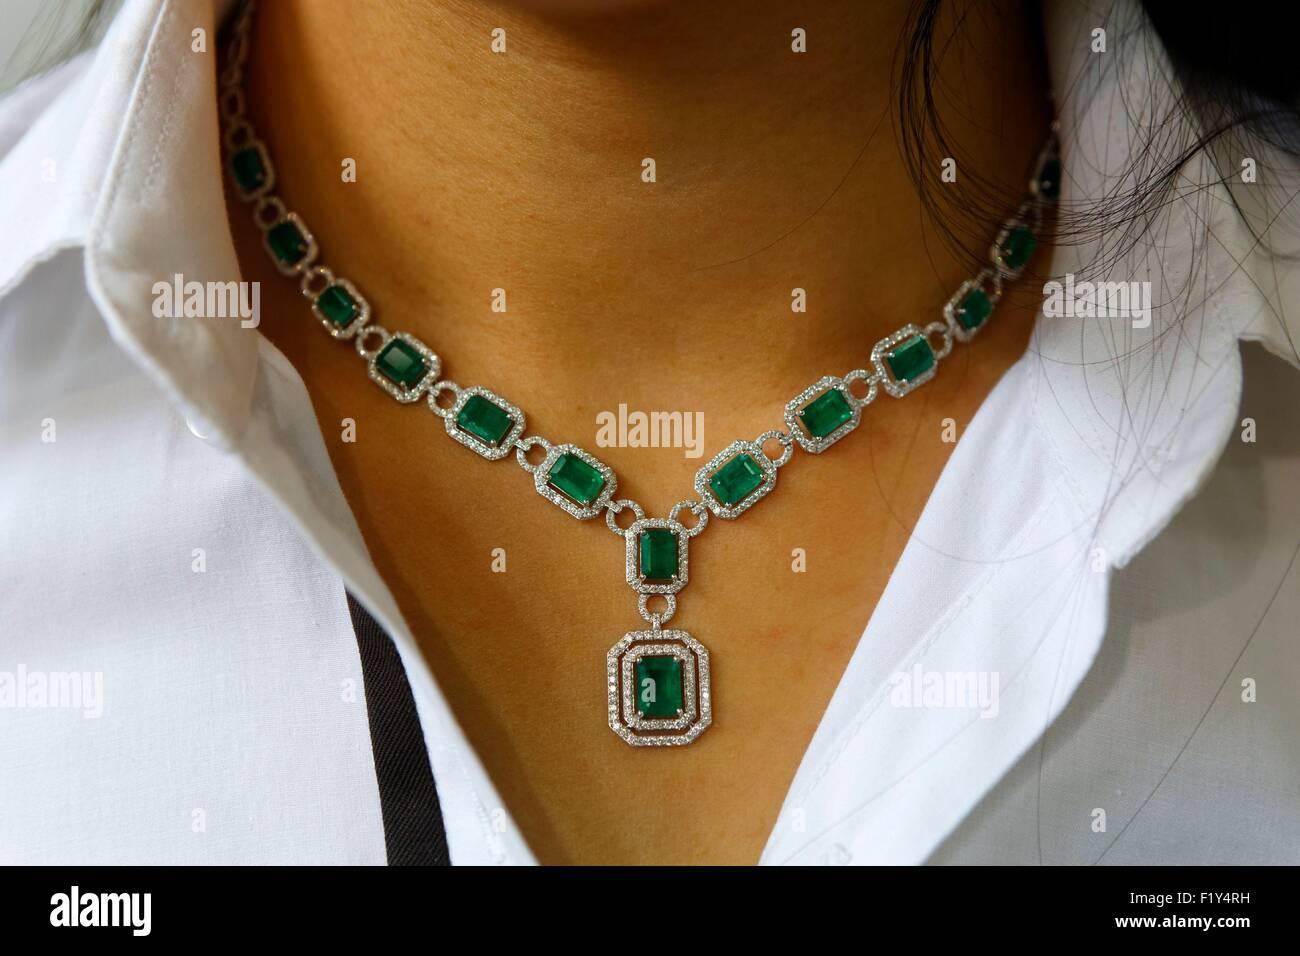 United Arab Emirates, Dubai, Al Quoz 1, Gold and Diamond Park, necklace with gemstones - Stock Image